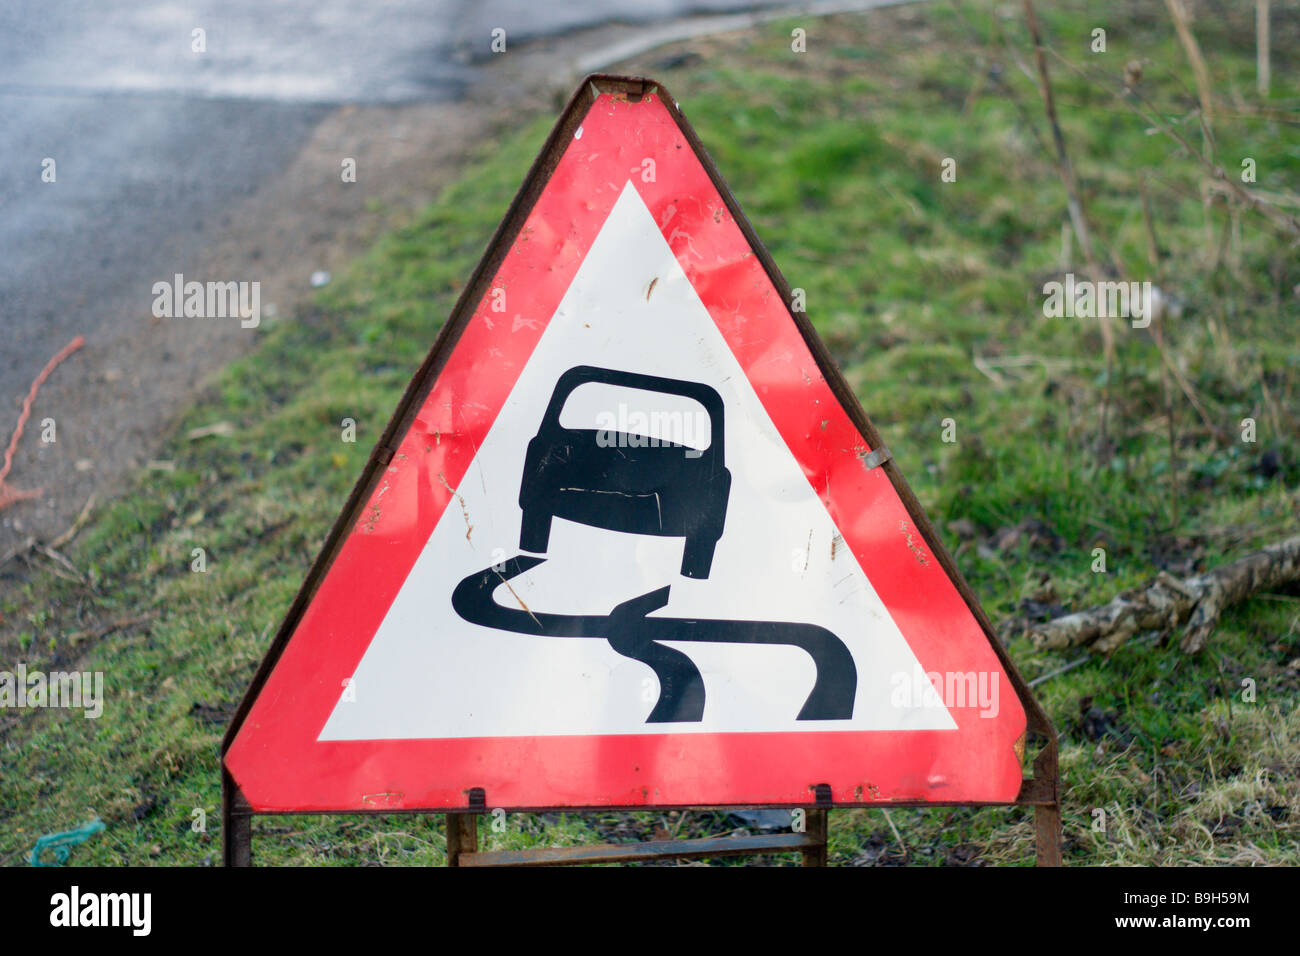 Slippery road warning roadsign - Stock Image